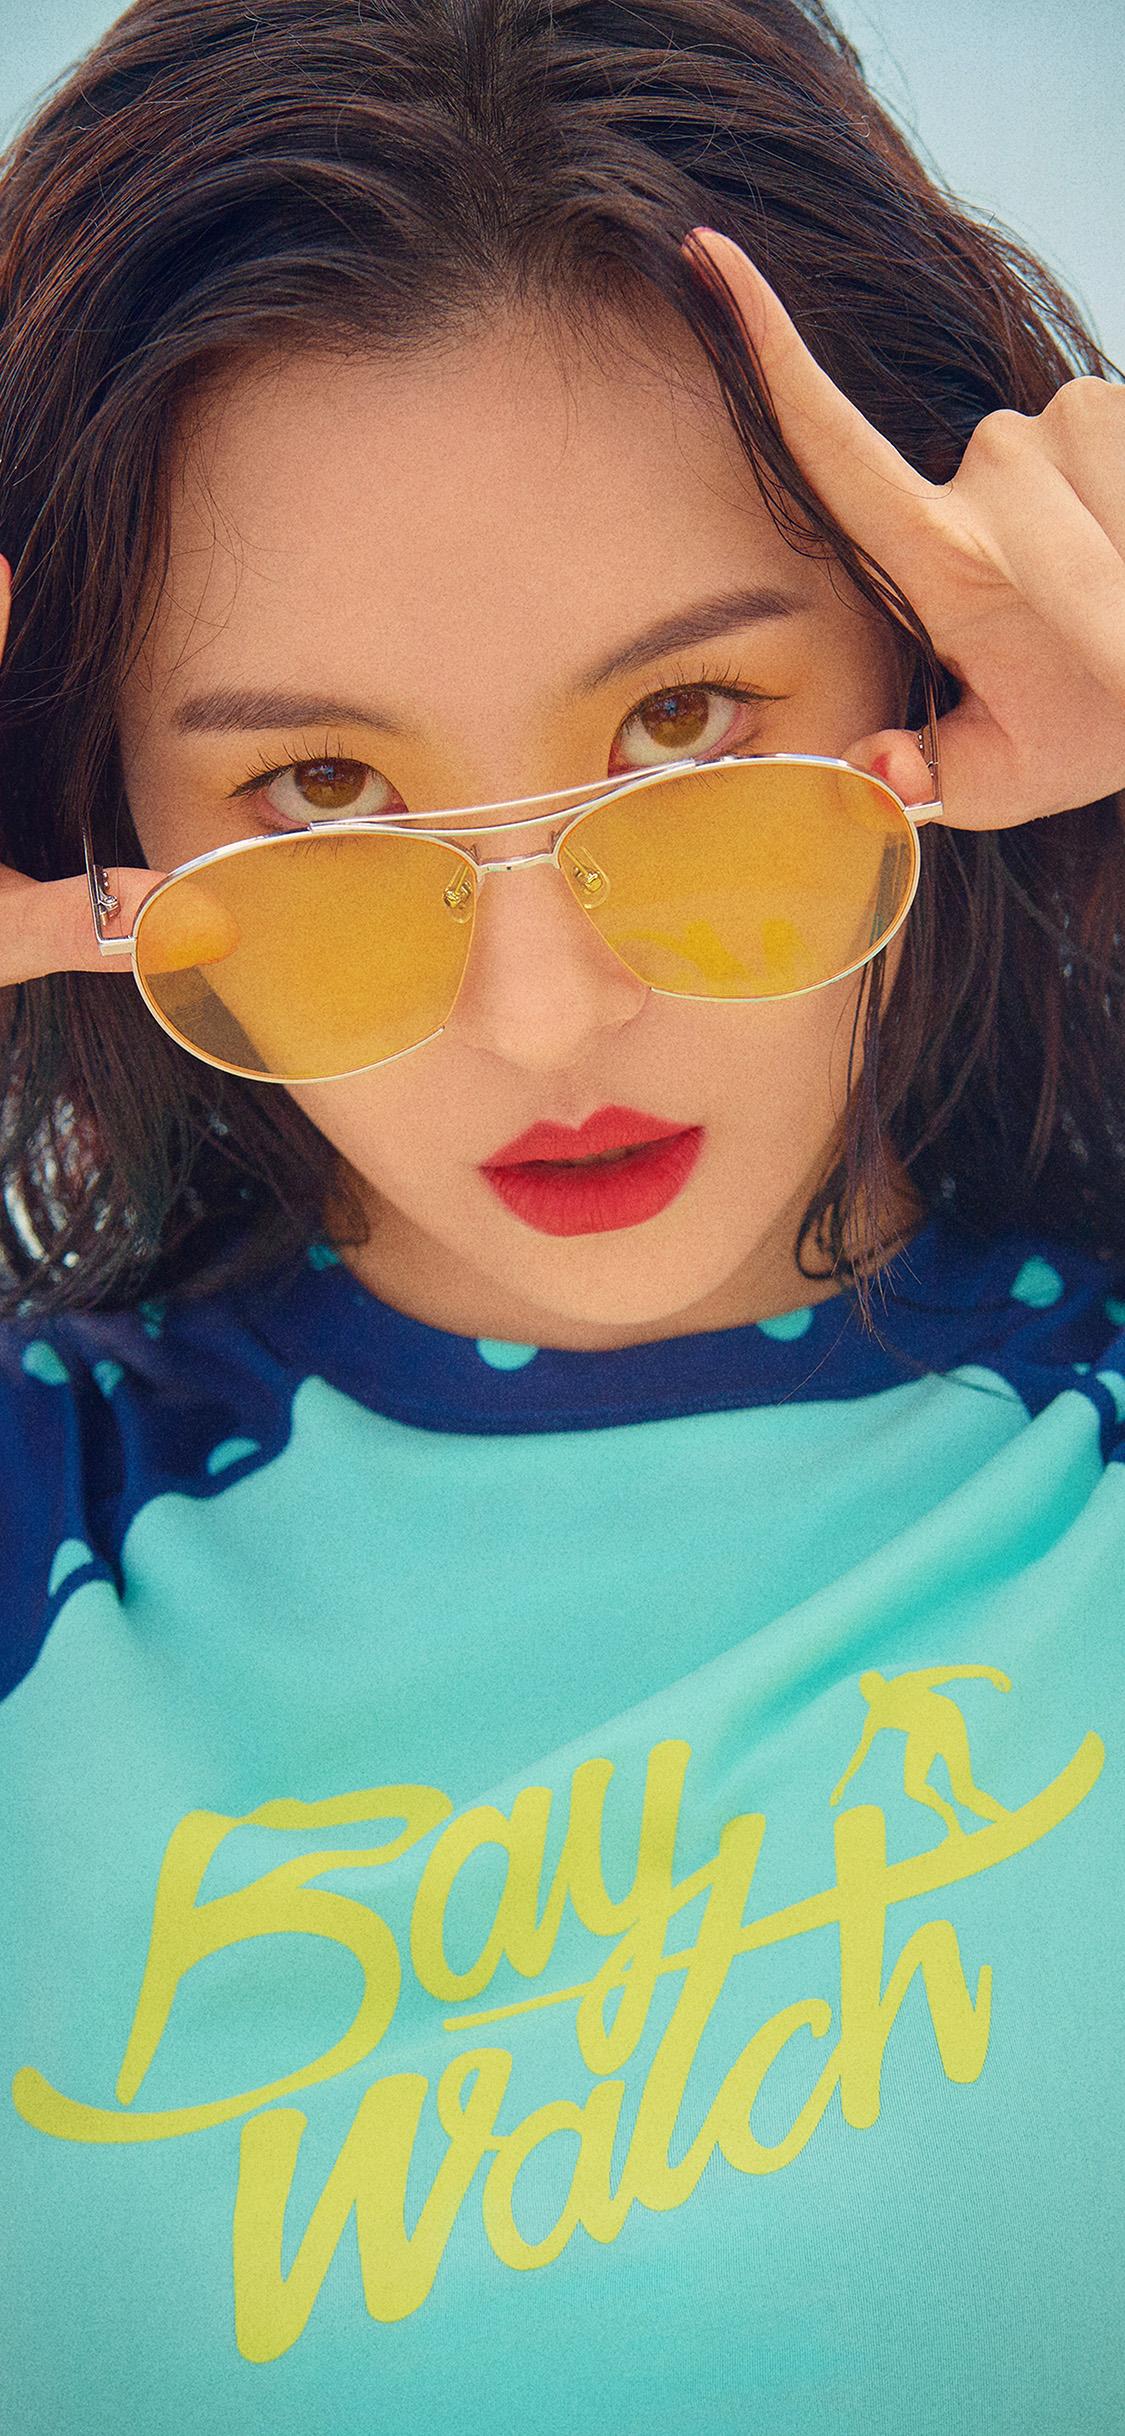 iPhonexpapers.com-Apple-iPhone-wallpaper-hq58-baywatch-girl-kpop-sunmi-summer-beach